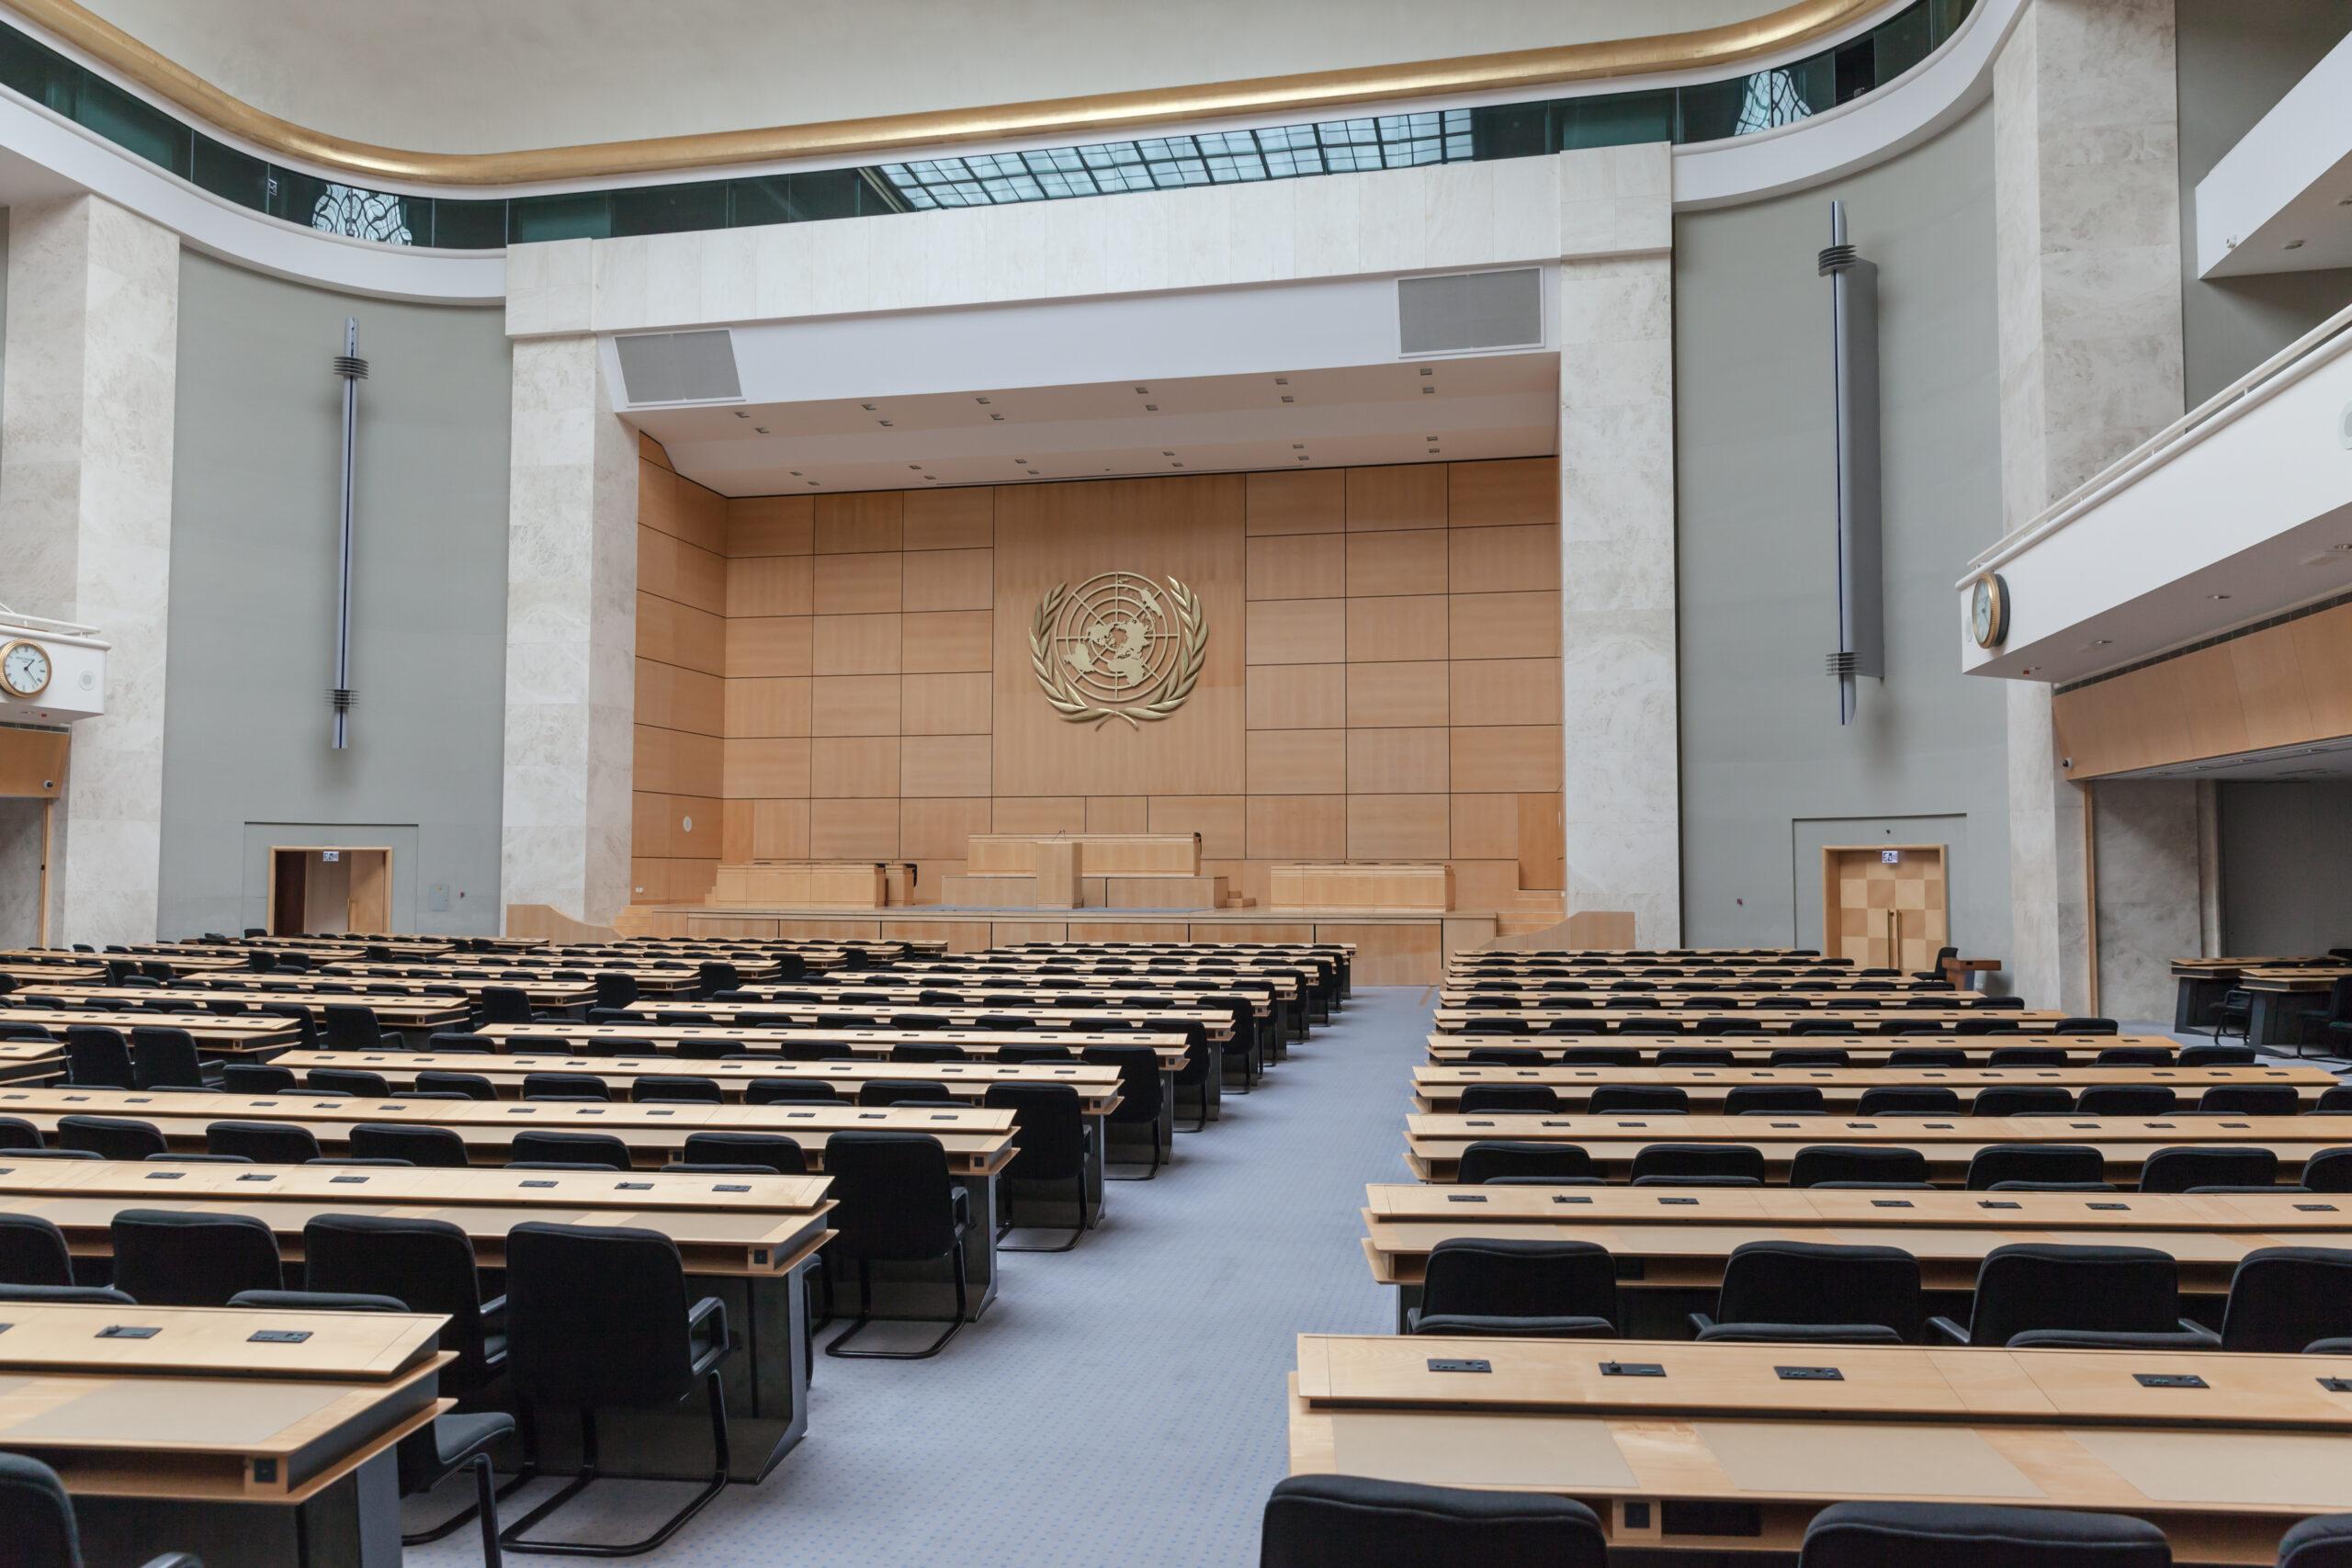 Geneva,,Switzerland, ,August,23,,2014, ,The,Assembly,Hall